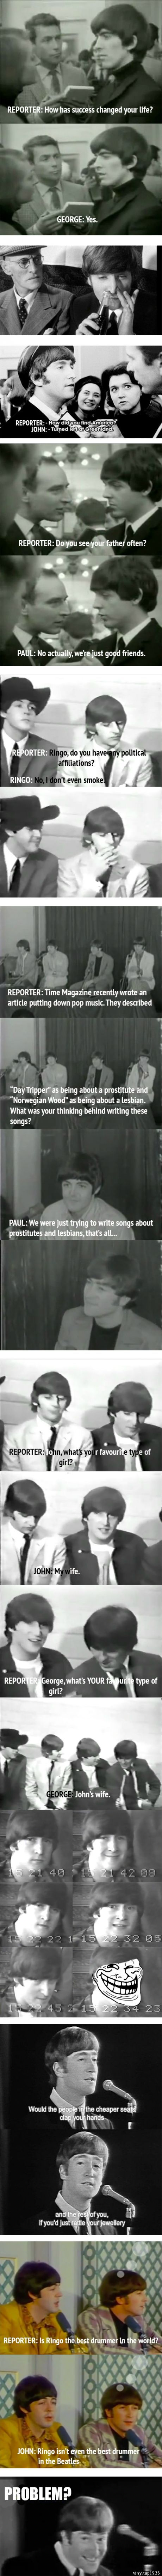 Problem? - The Beatles, those cheeky devils. You gotta love them. <3   #Beatles #Quiz